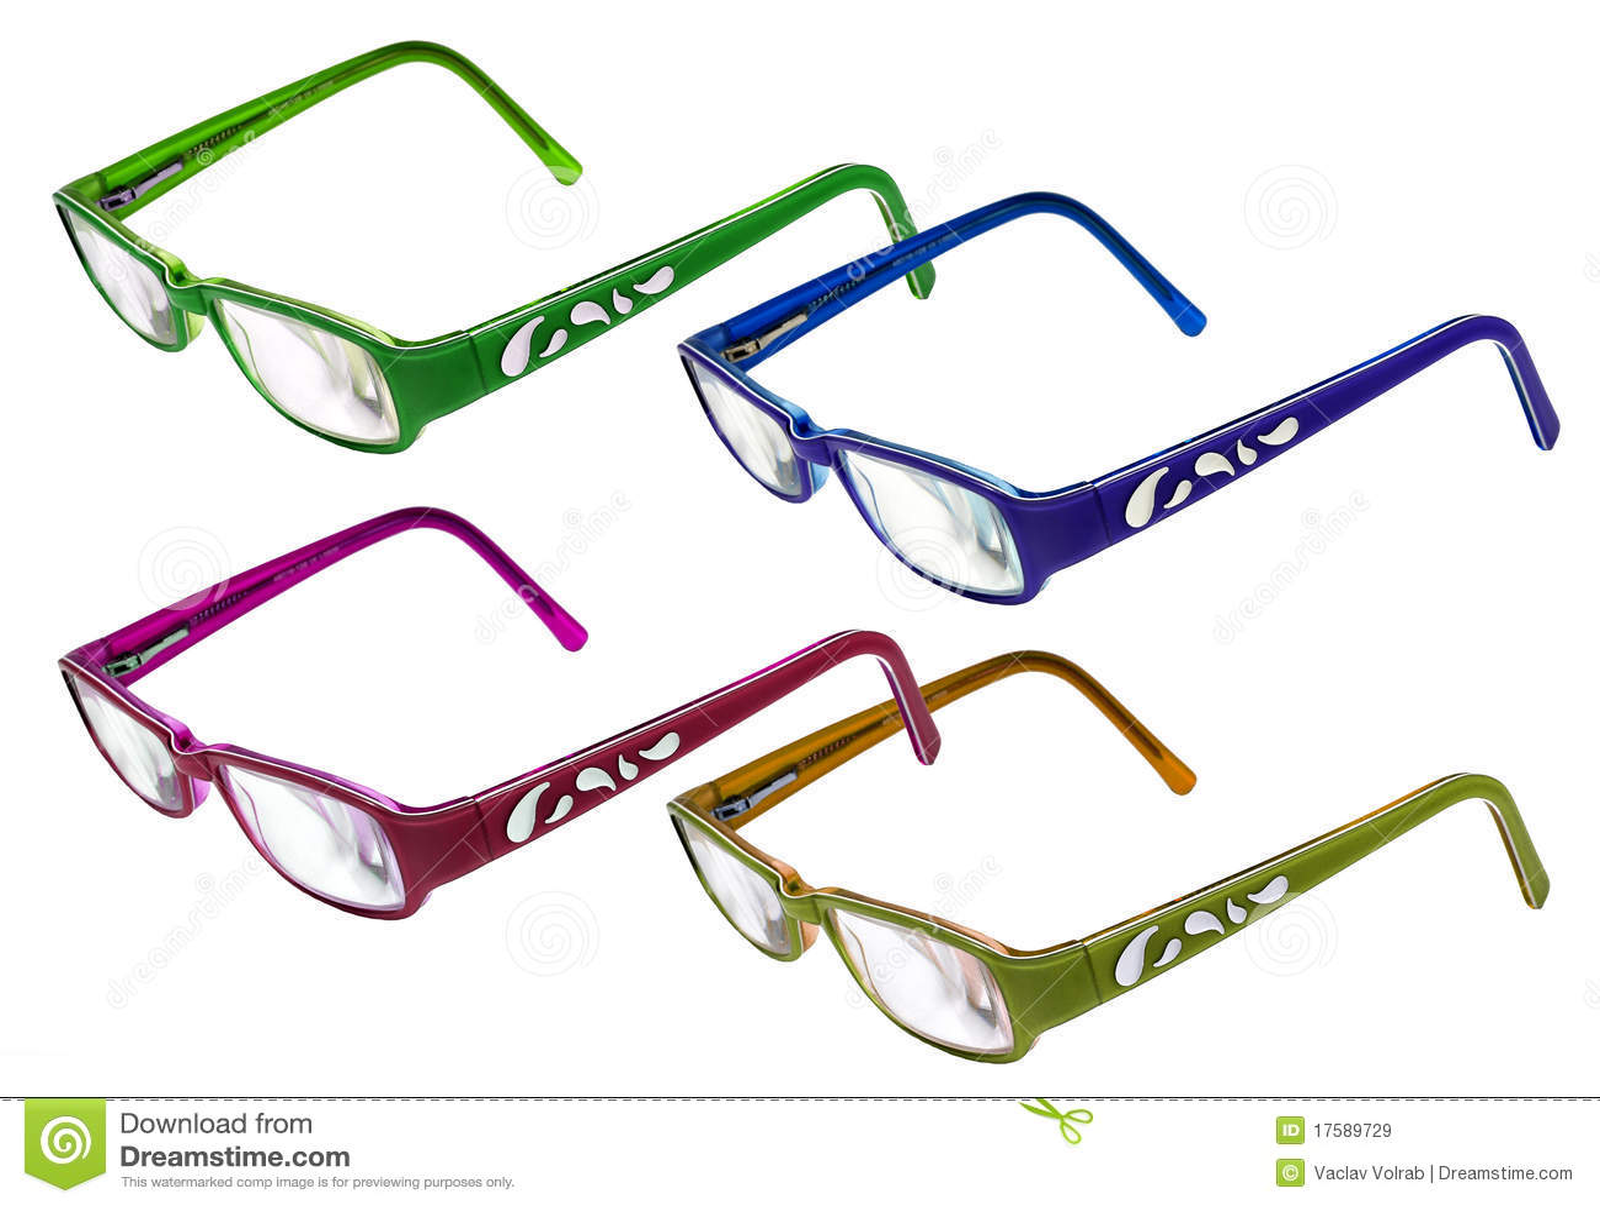 8456f19ba1f Colorful eyeglasses stock image of eyesight color jpg 1300x996 Colorful  eyeglasses